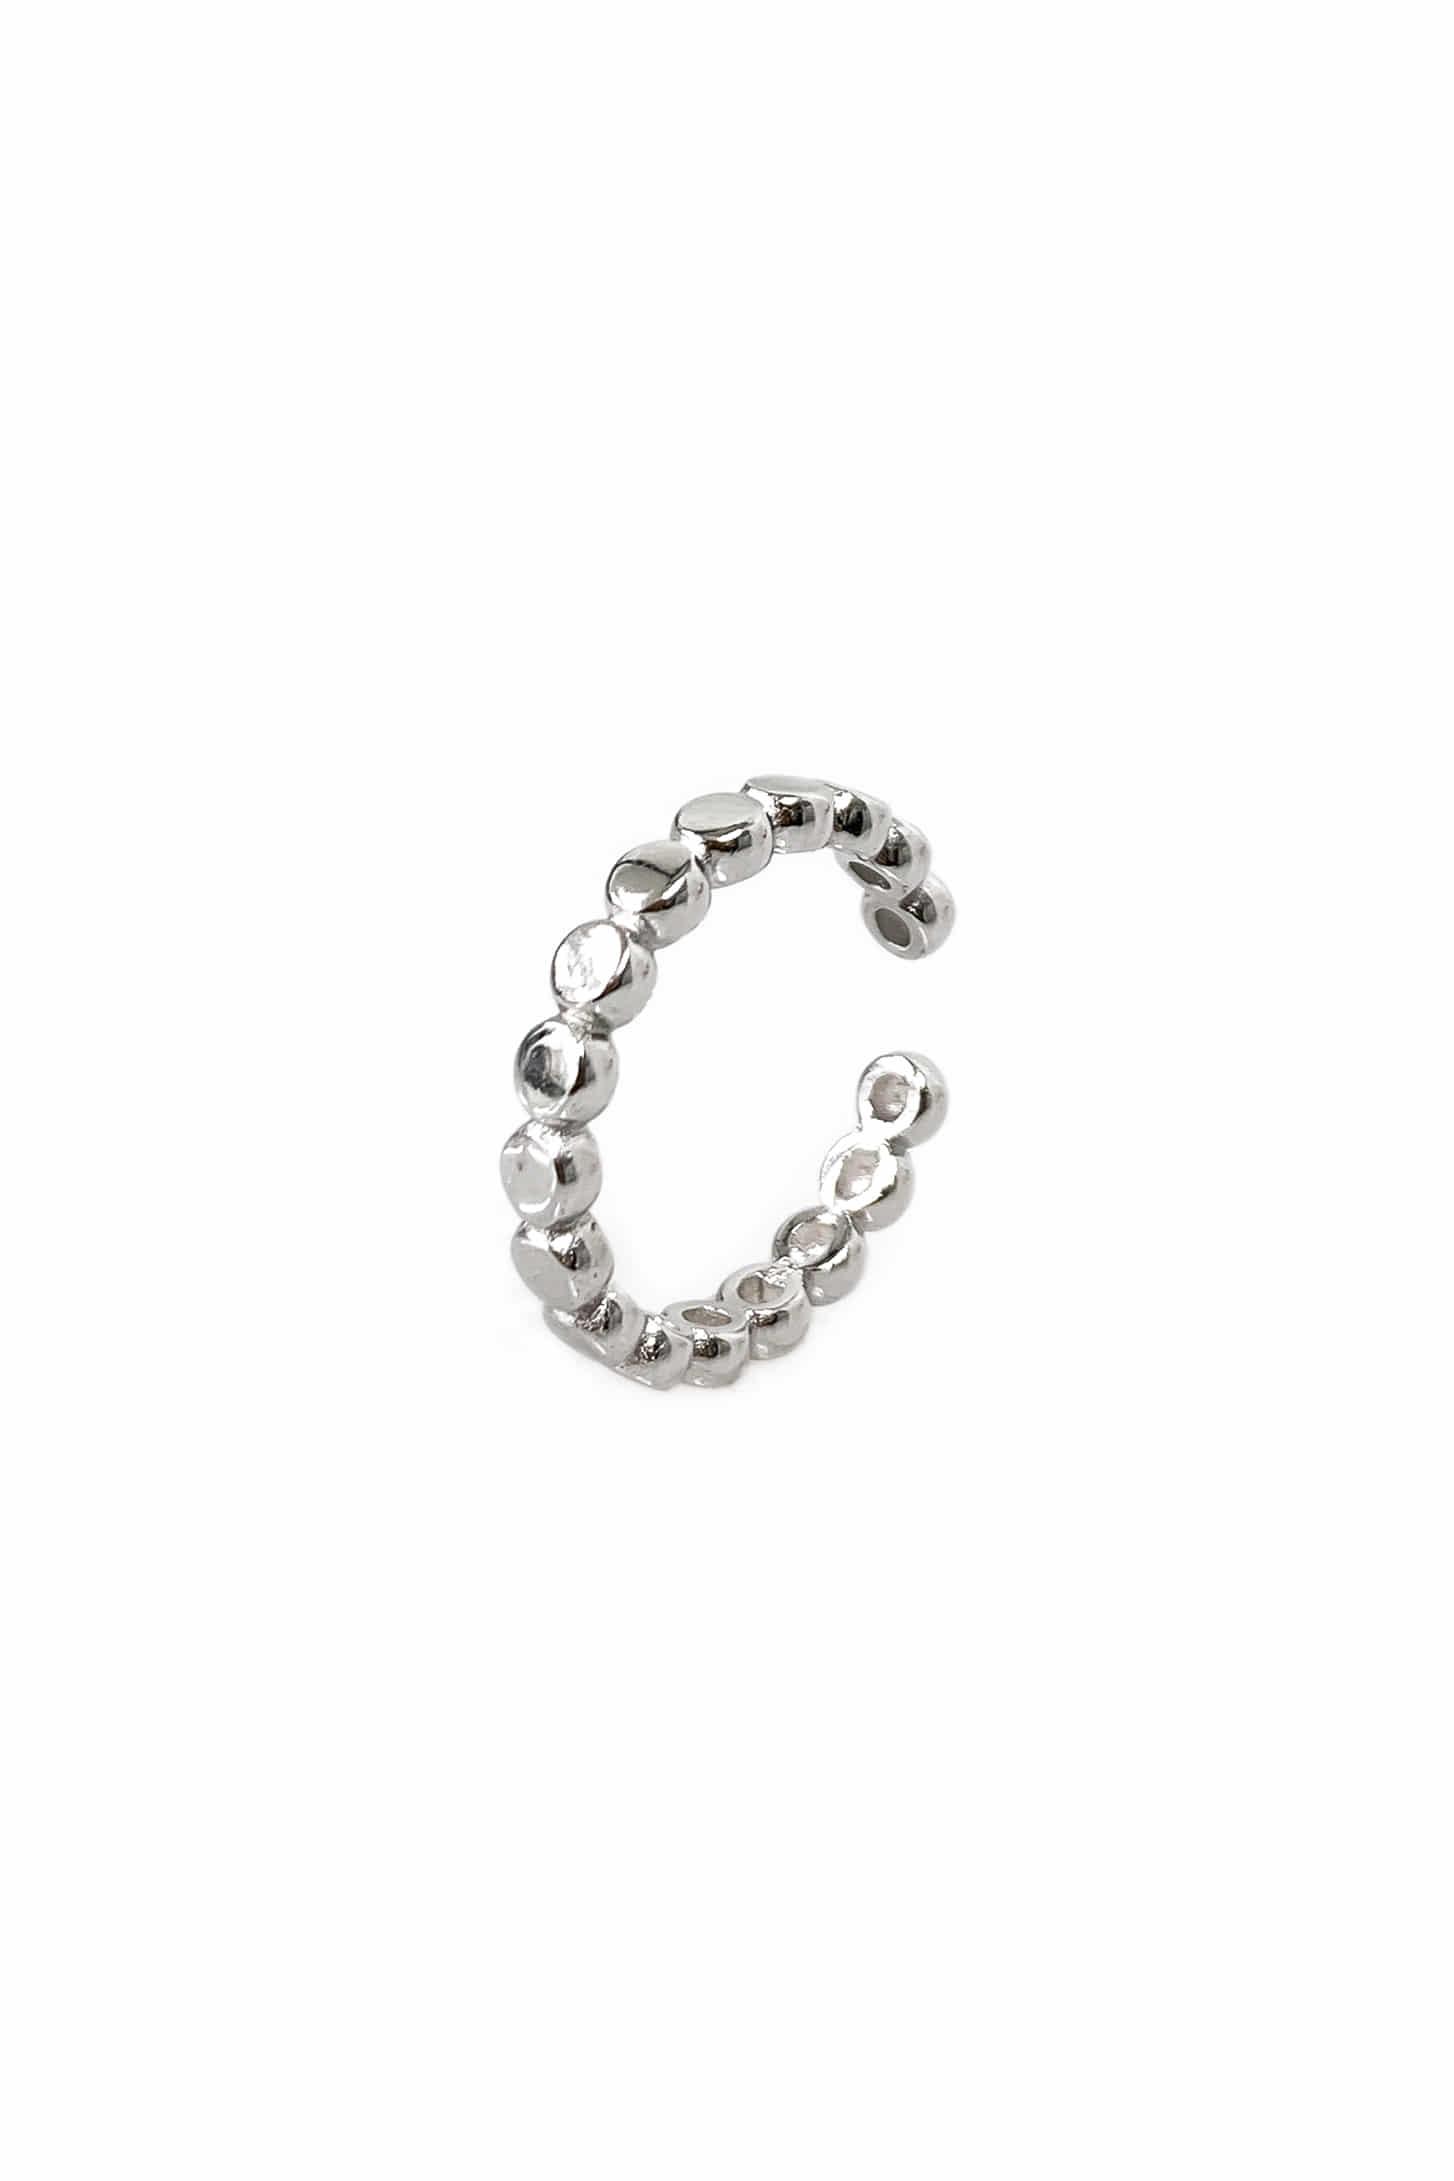 [silver925] 조약돌 오픈 반지